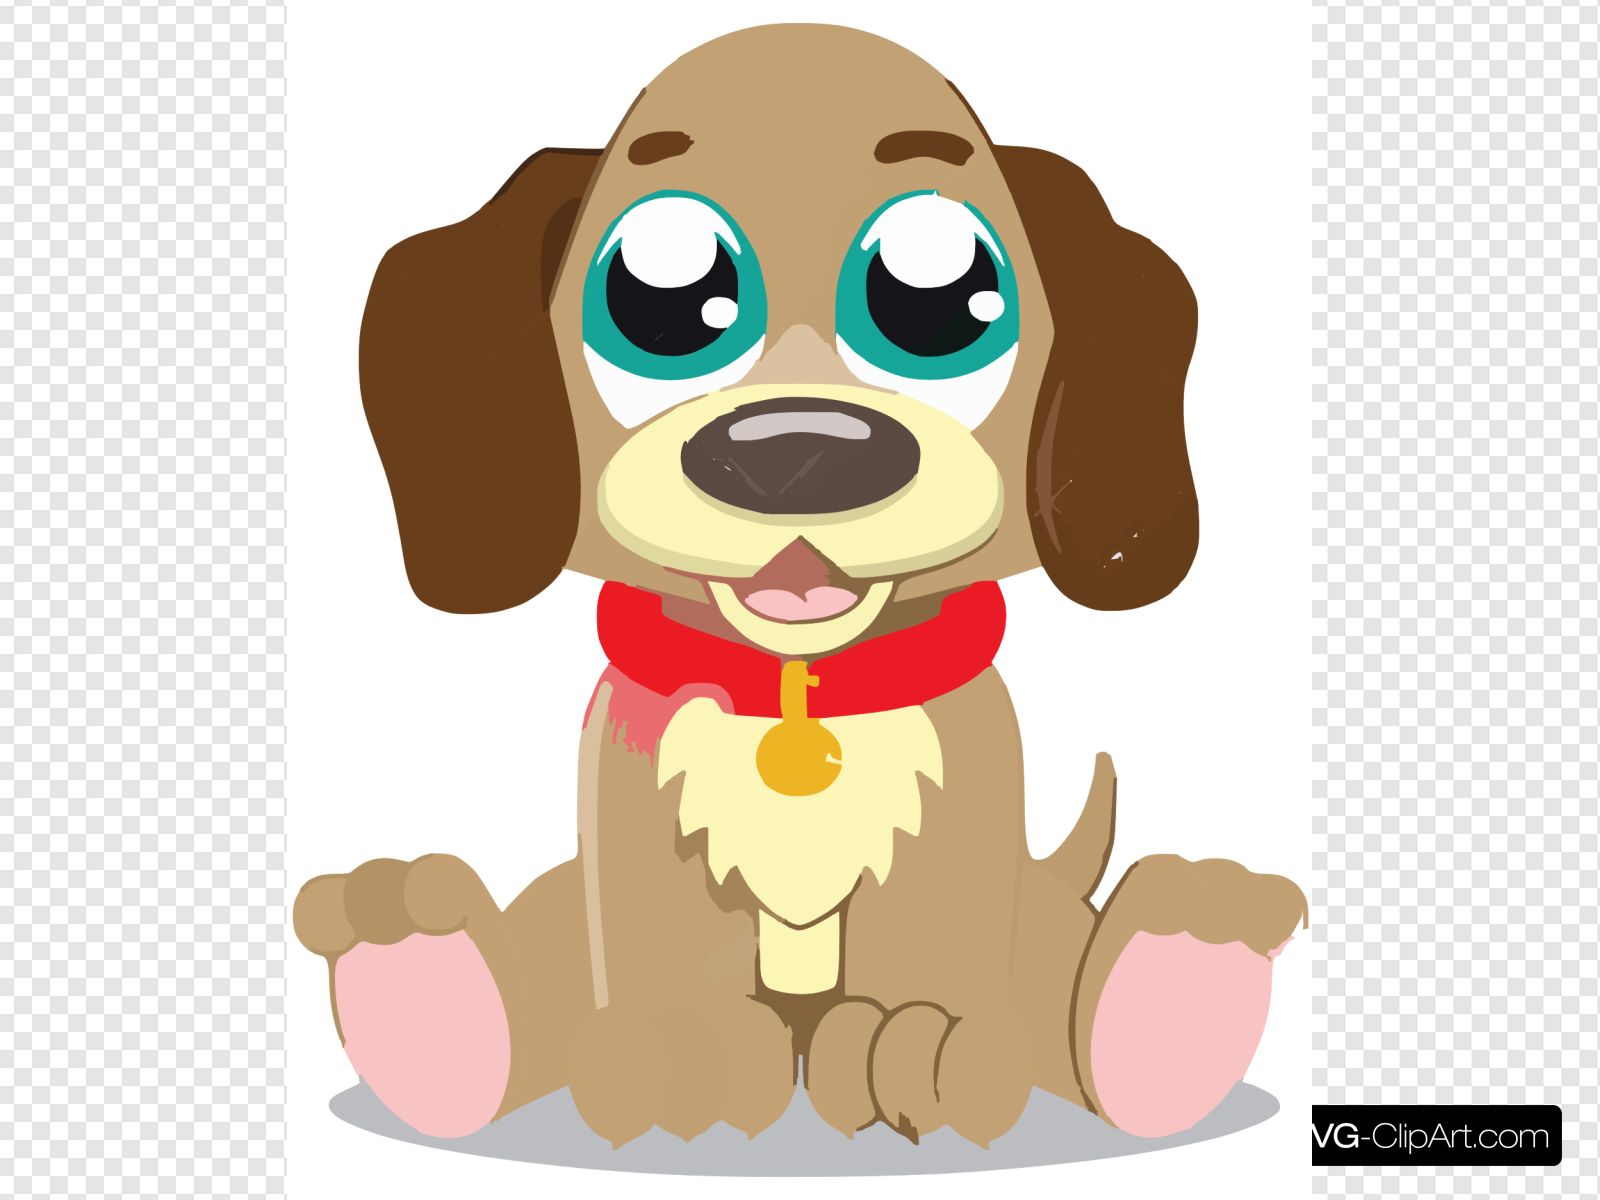 Cute Cartoon Puppy Clip art, Icon and SVG.